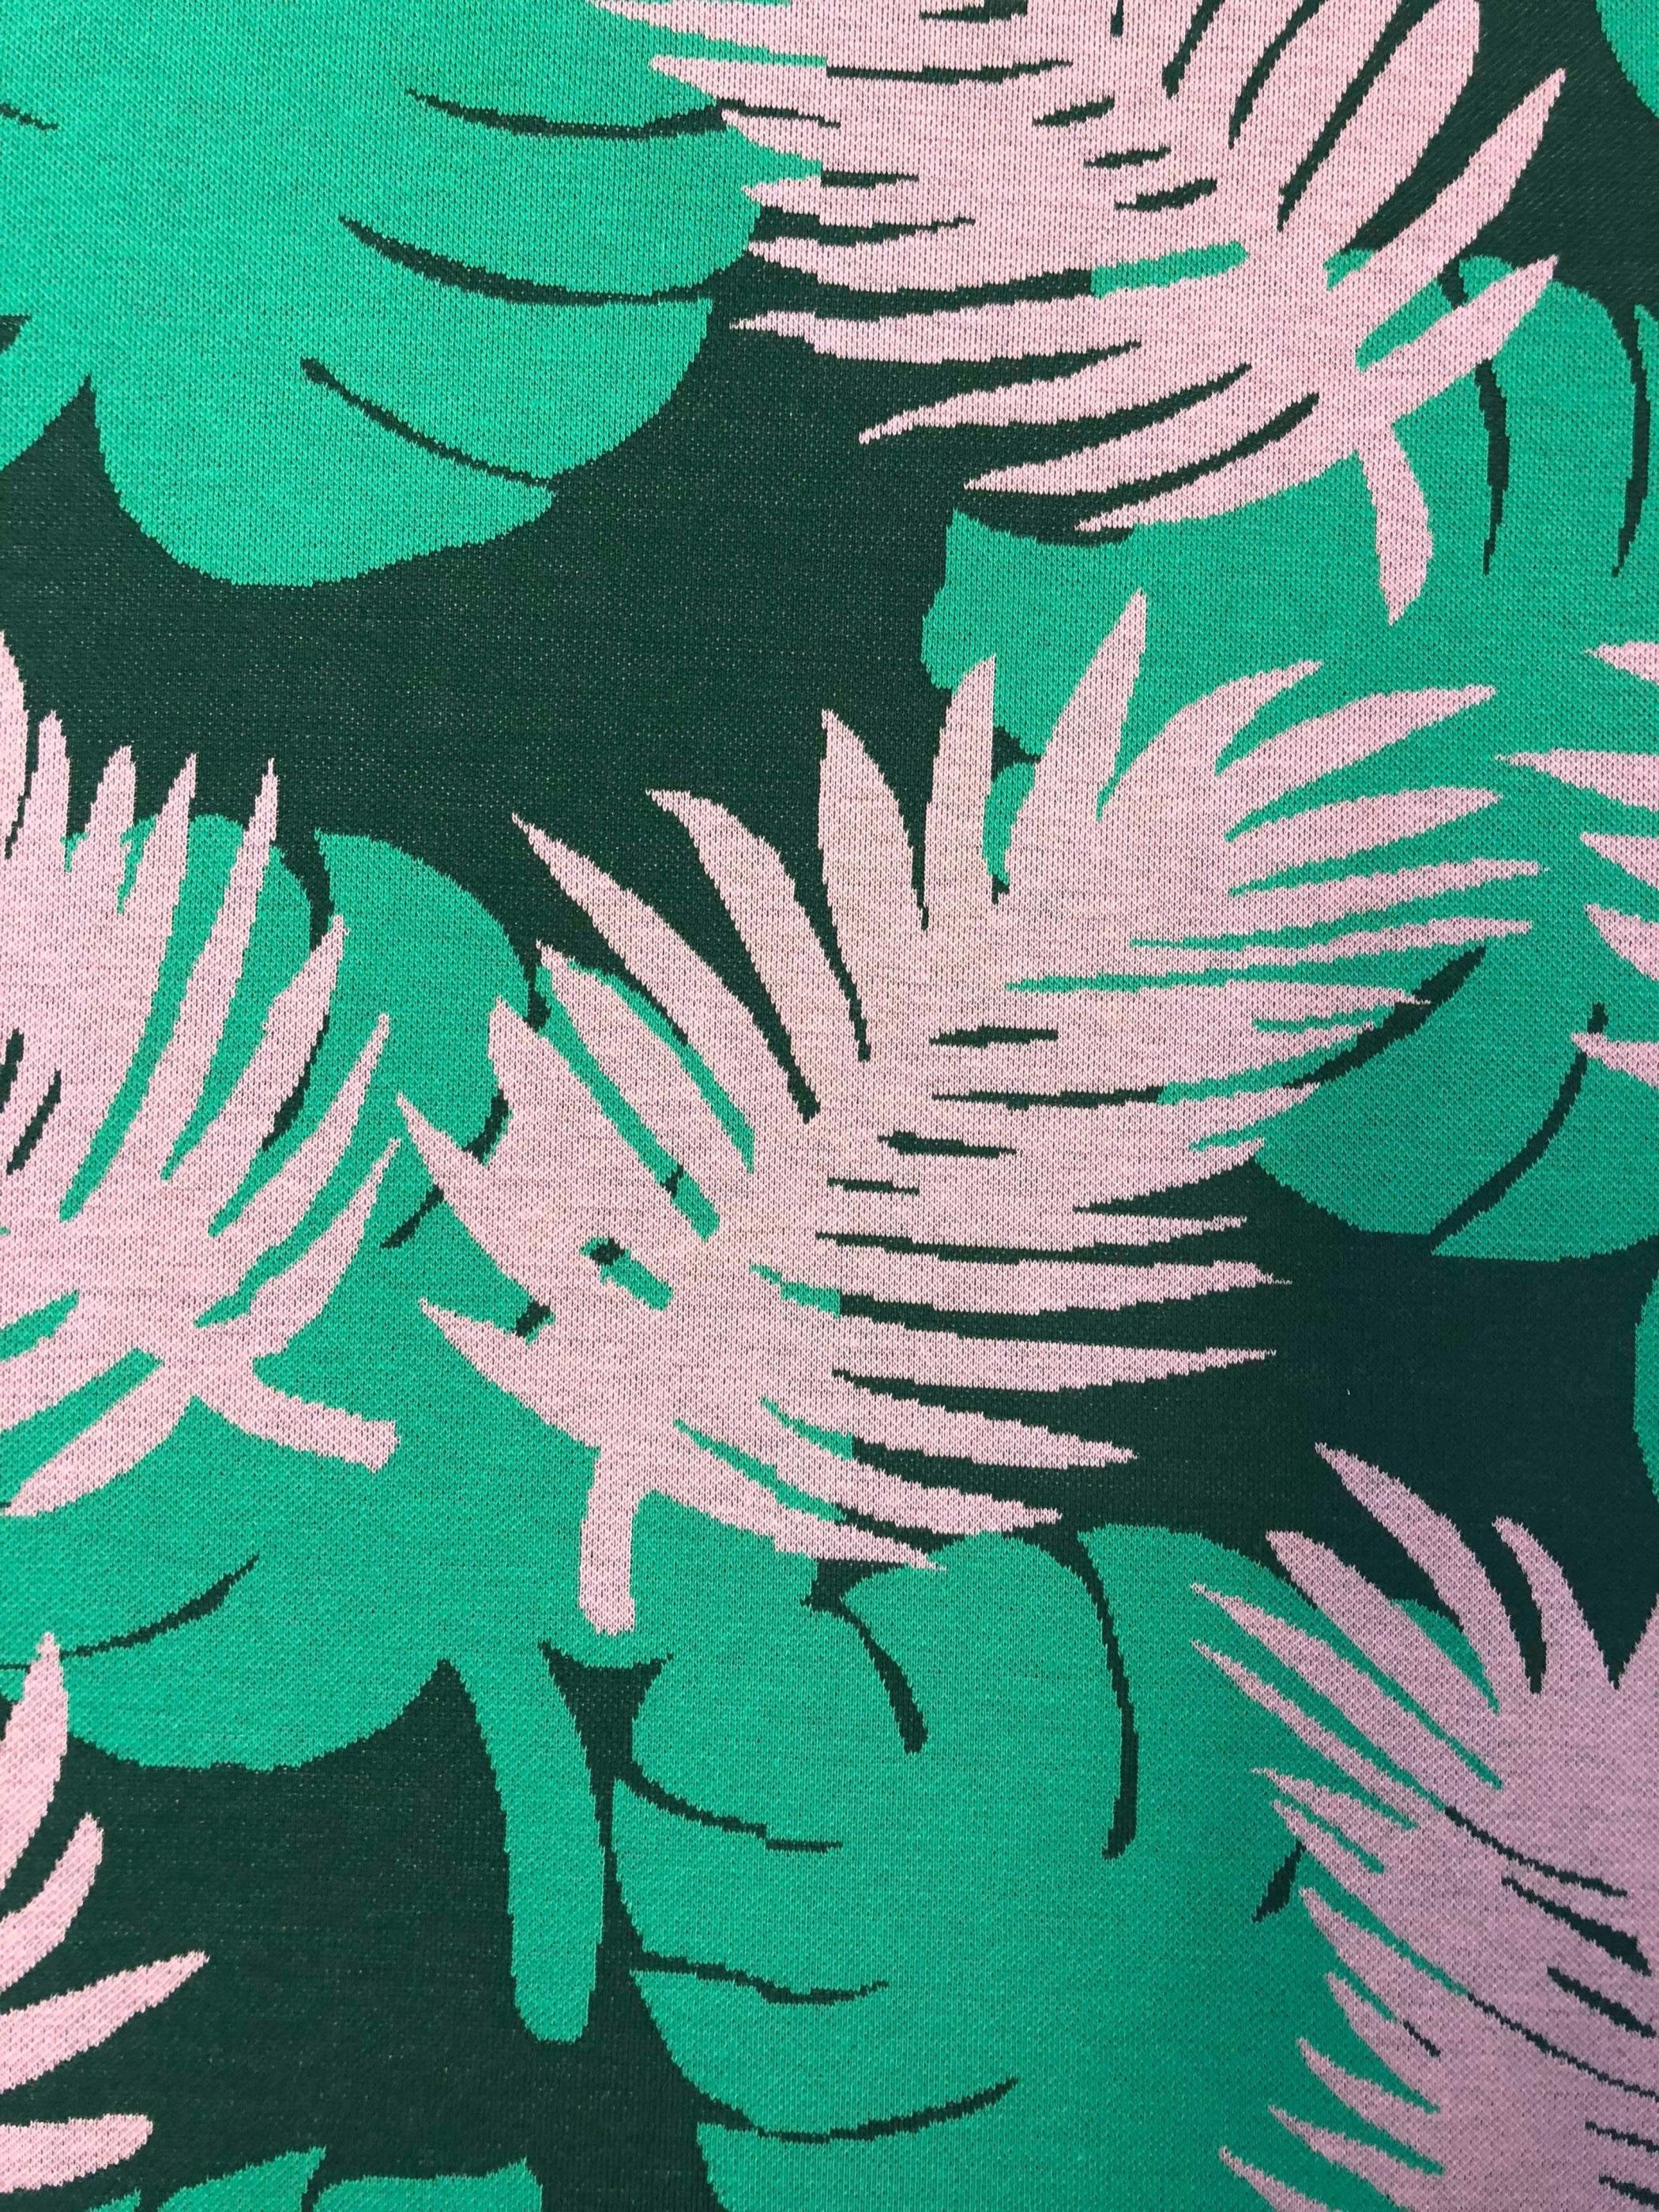 Jaquard bomull rosa grön monstrea modetyg metervara Tyglust Laholm